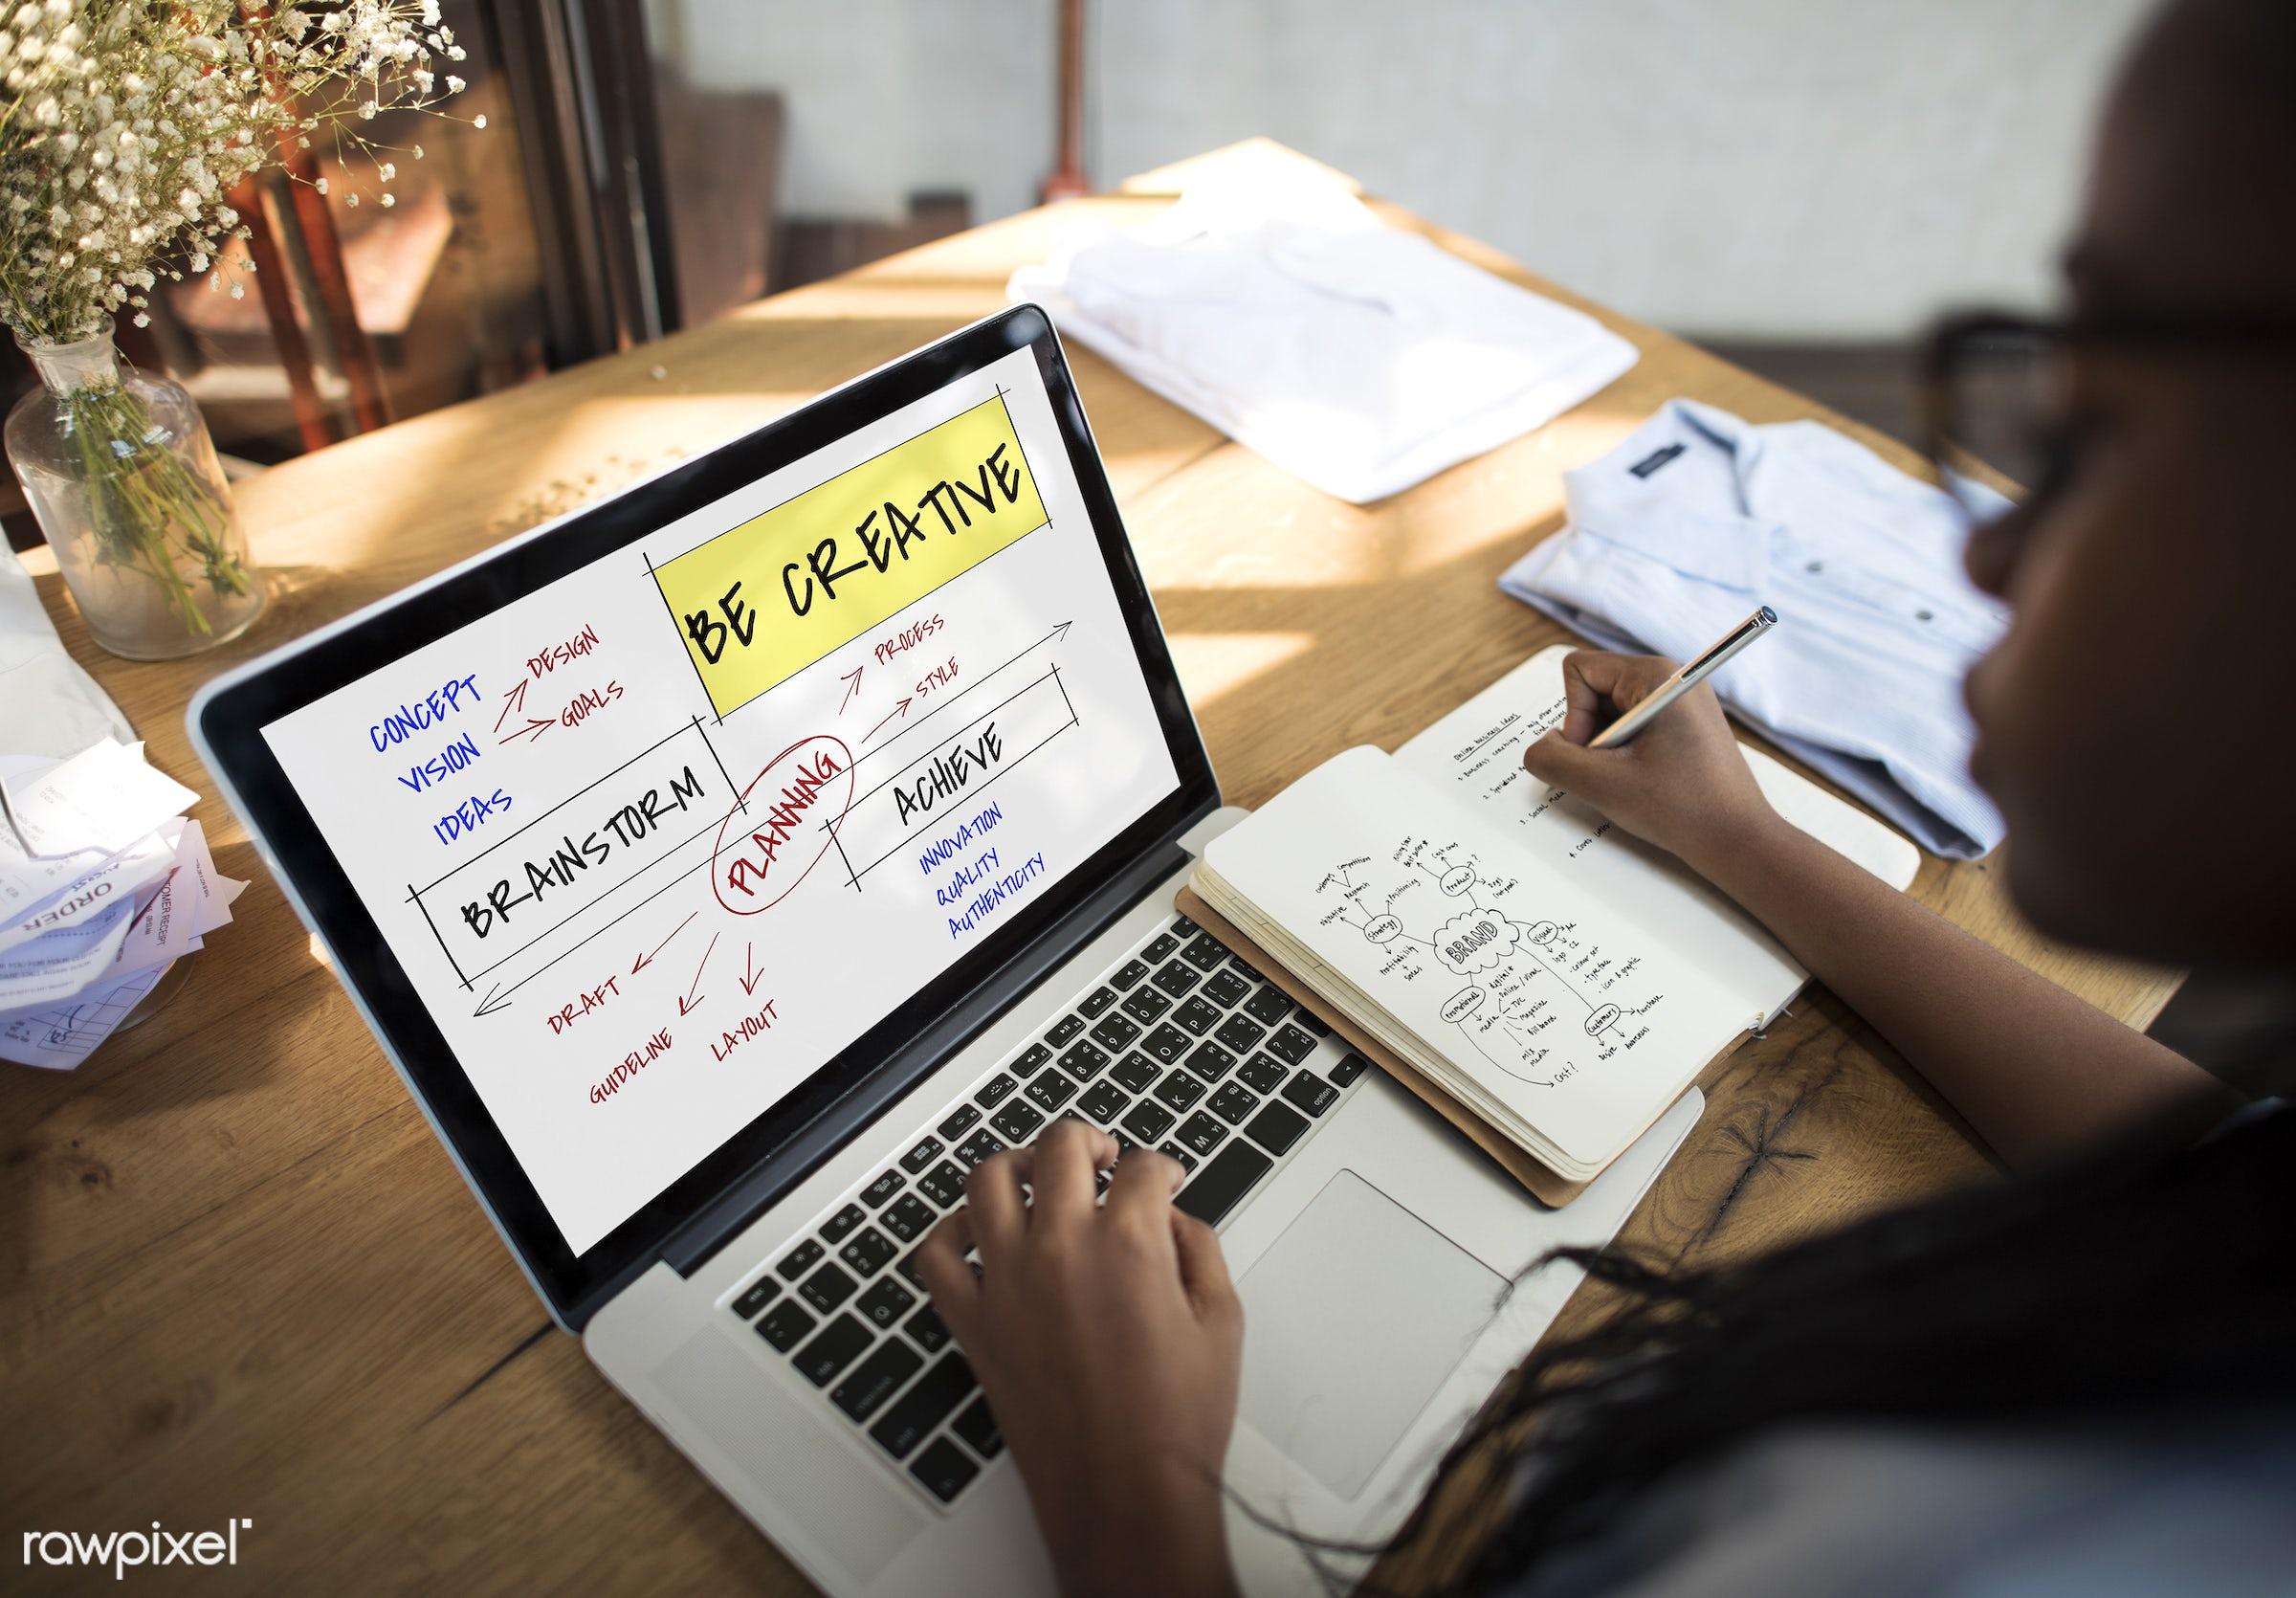 achieve, authenticity, back, be creative, brainstorm, browsing, chart, creative, creativity, design, device, diagram,...